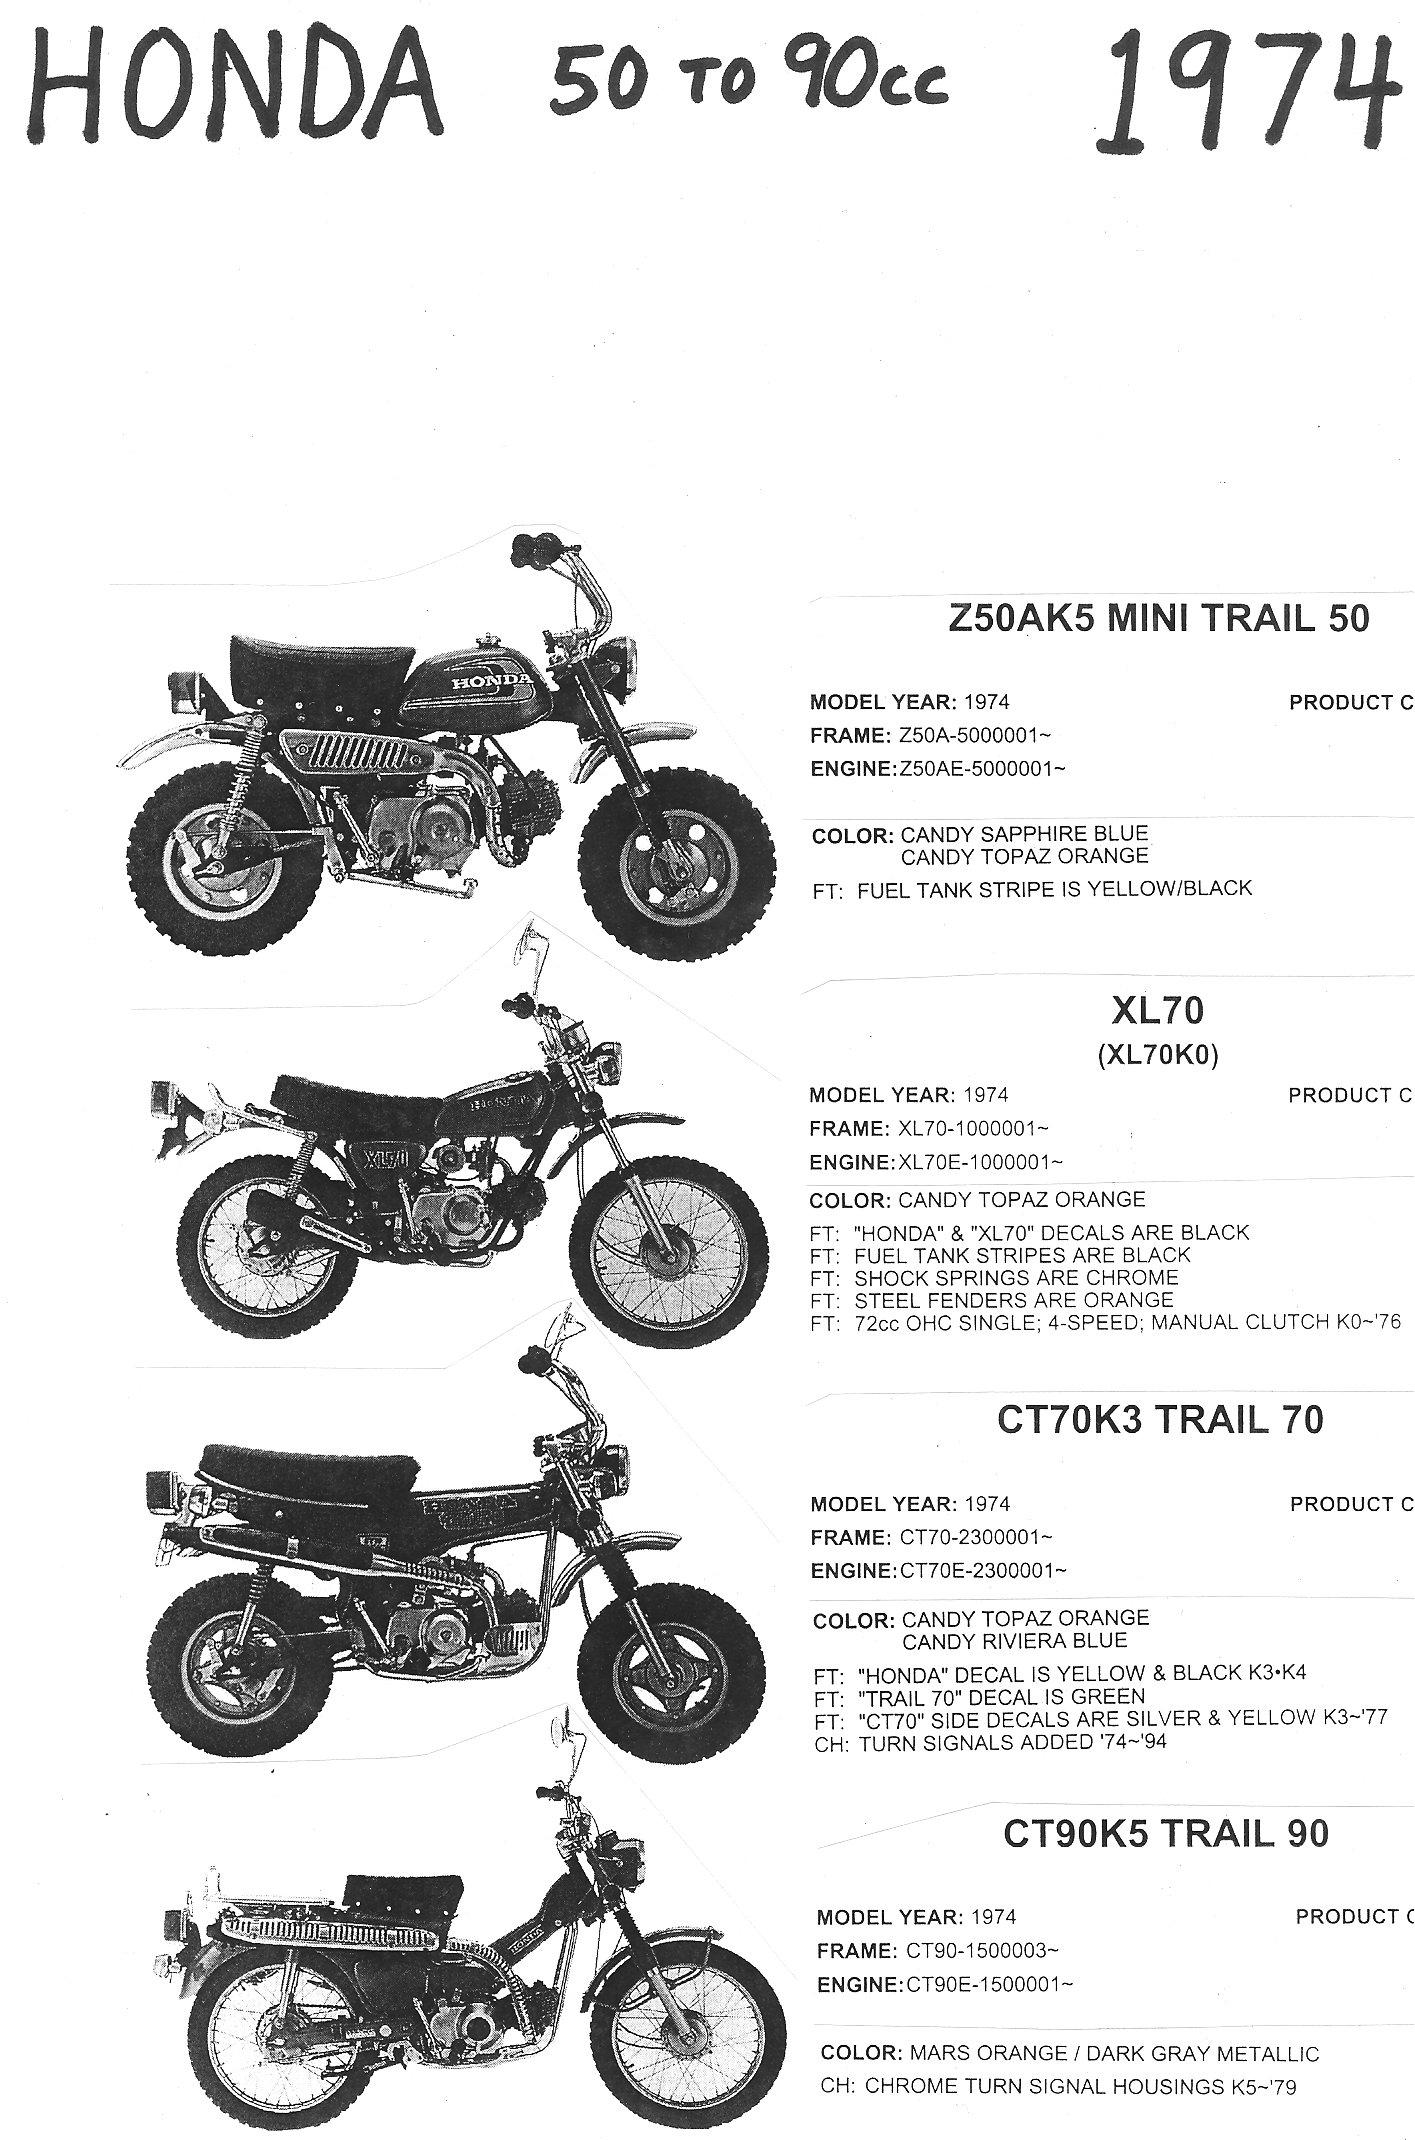 1973 kawasaki 90 wiring diagrams tr 5762  wiring diagram additionally honda on ct70 free download  wiring diagram additionally honda on